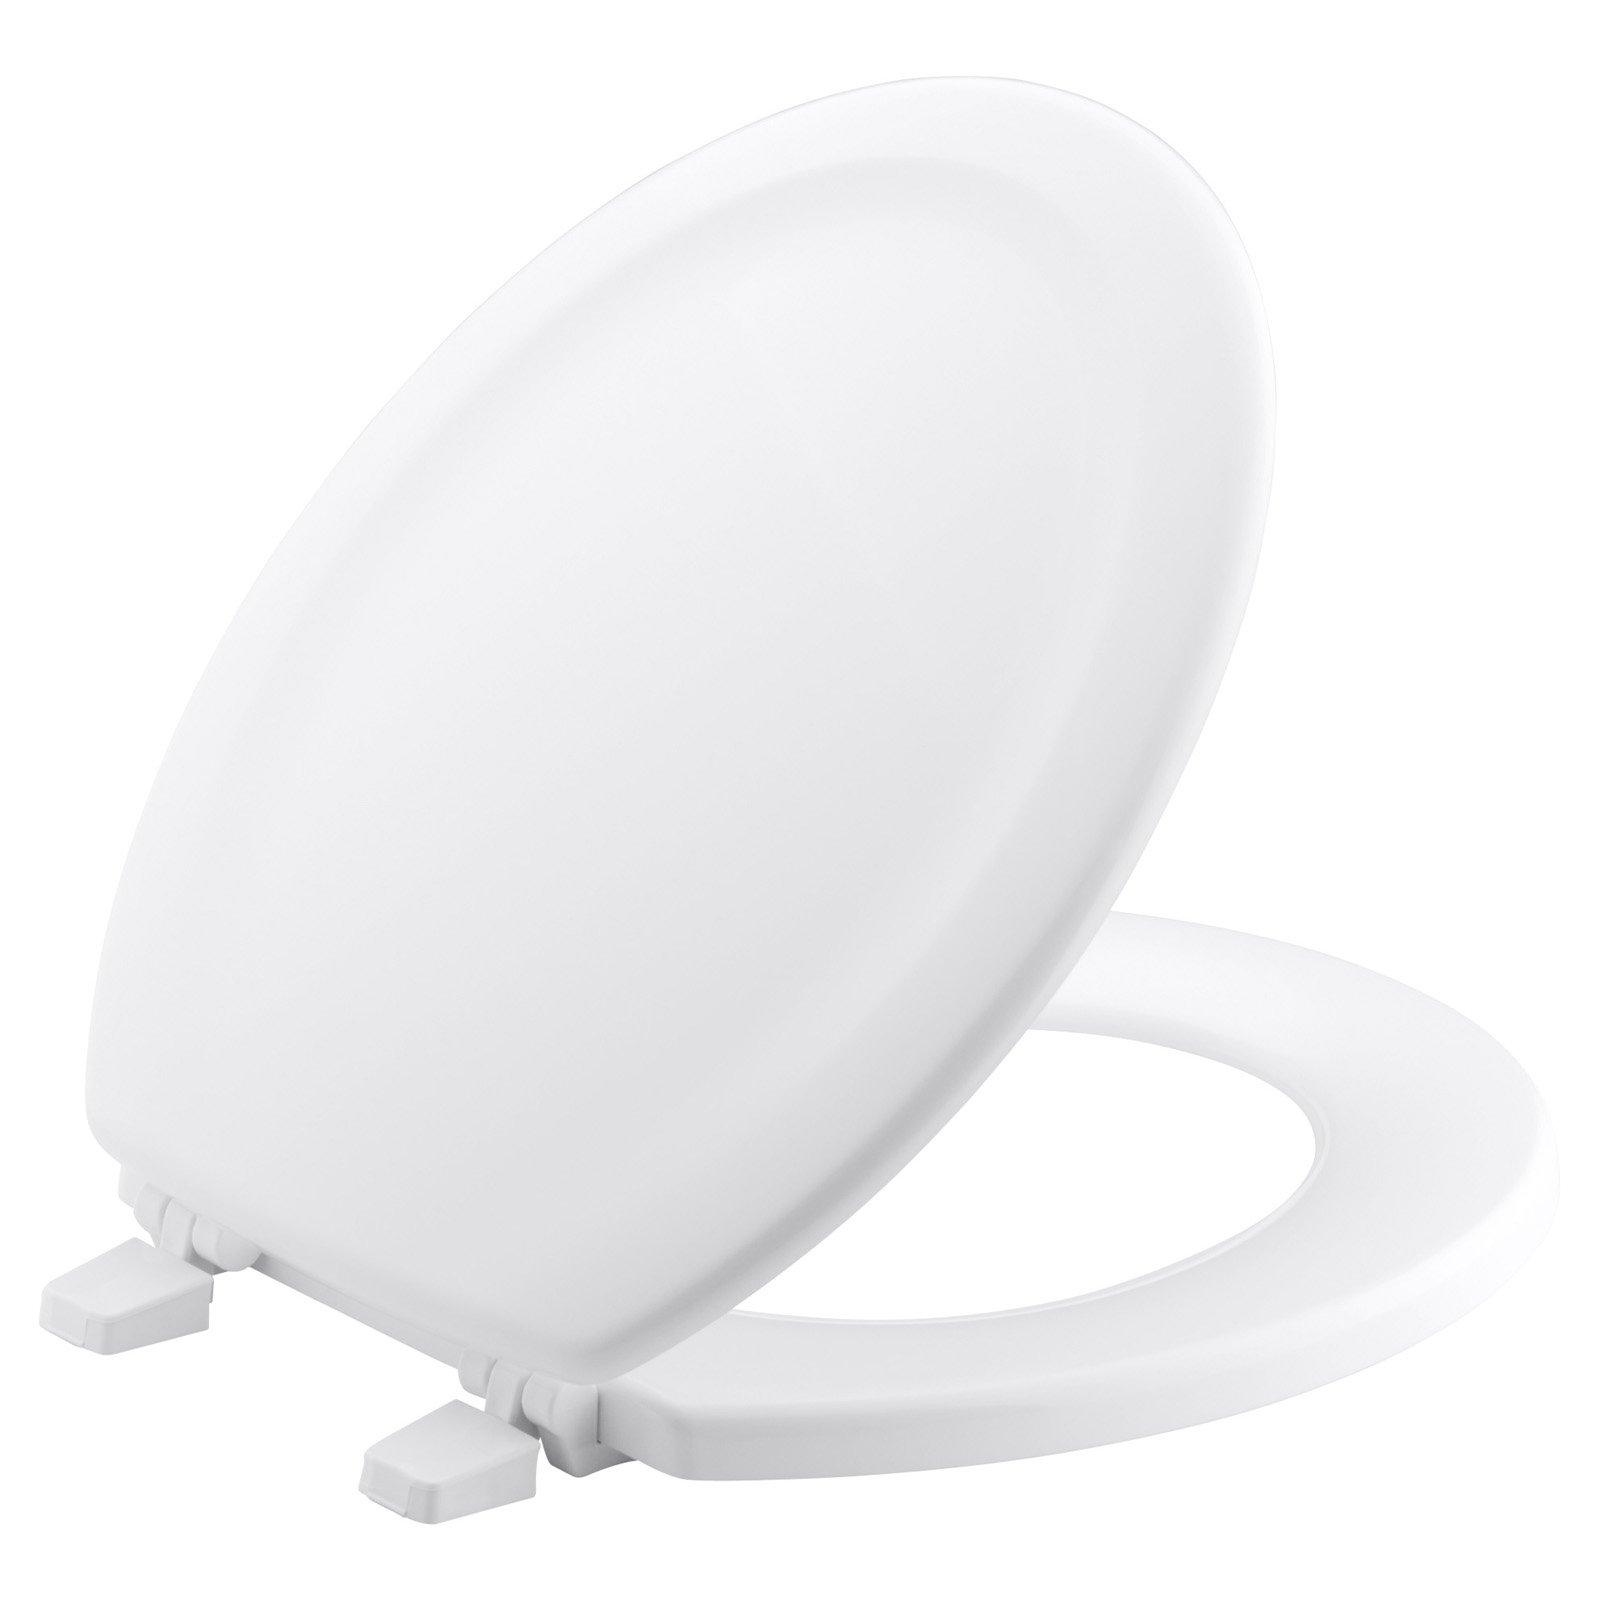 Kohler Stonewood Round Front Toilet Seat White In 2019 Products